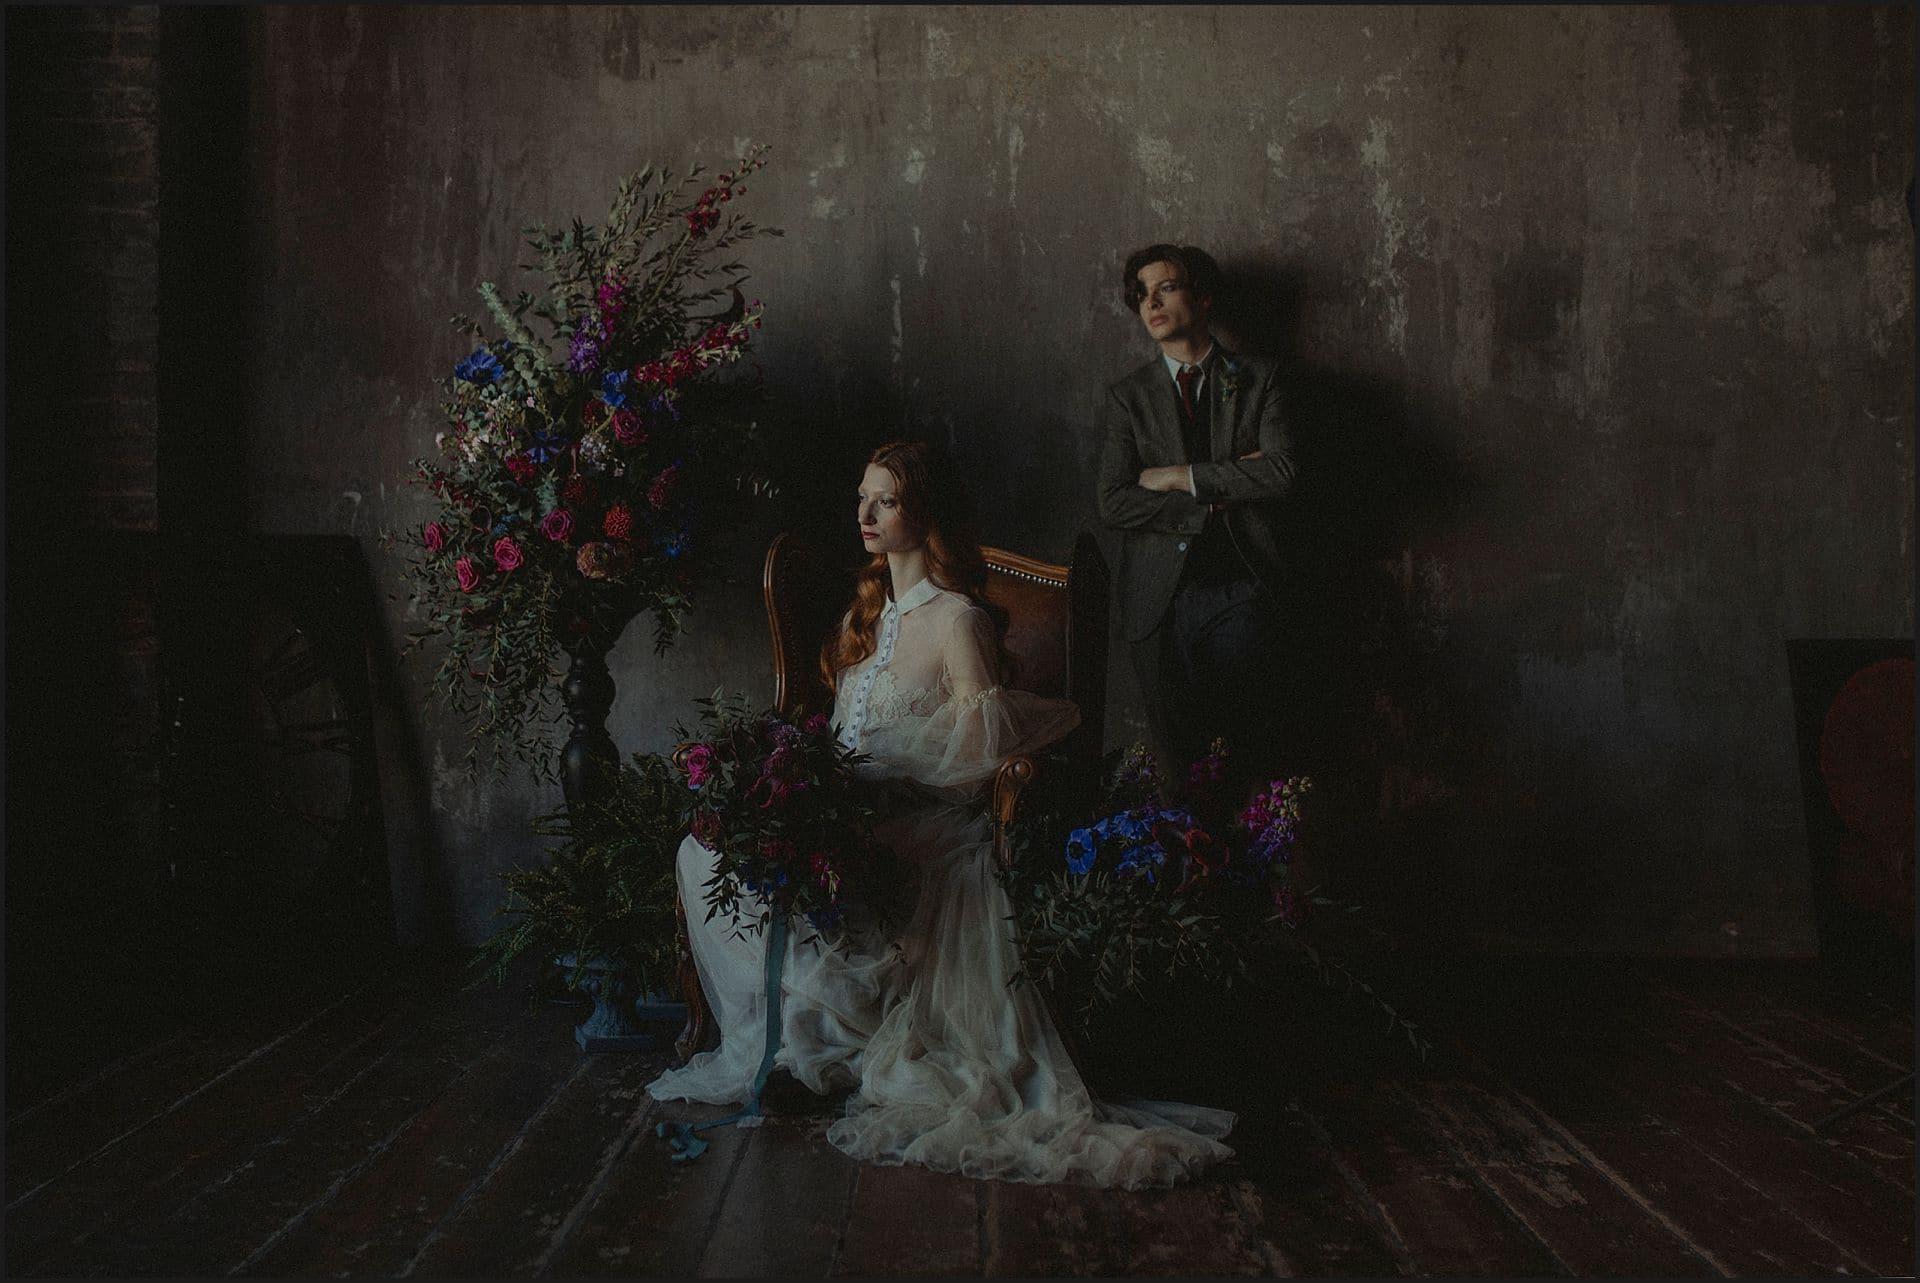 rock and roll bride, decadence, bouquet, groom, wedding dress, unconventional wedding, cross studio, milan, wedding photographer, wedding in italy